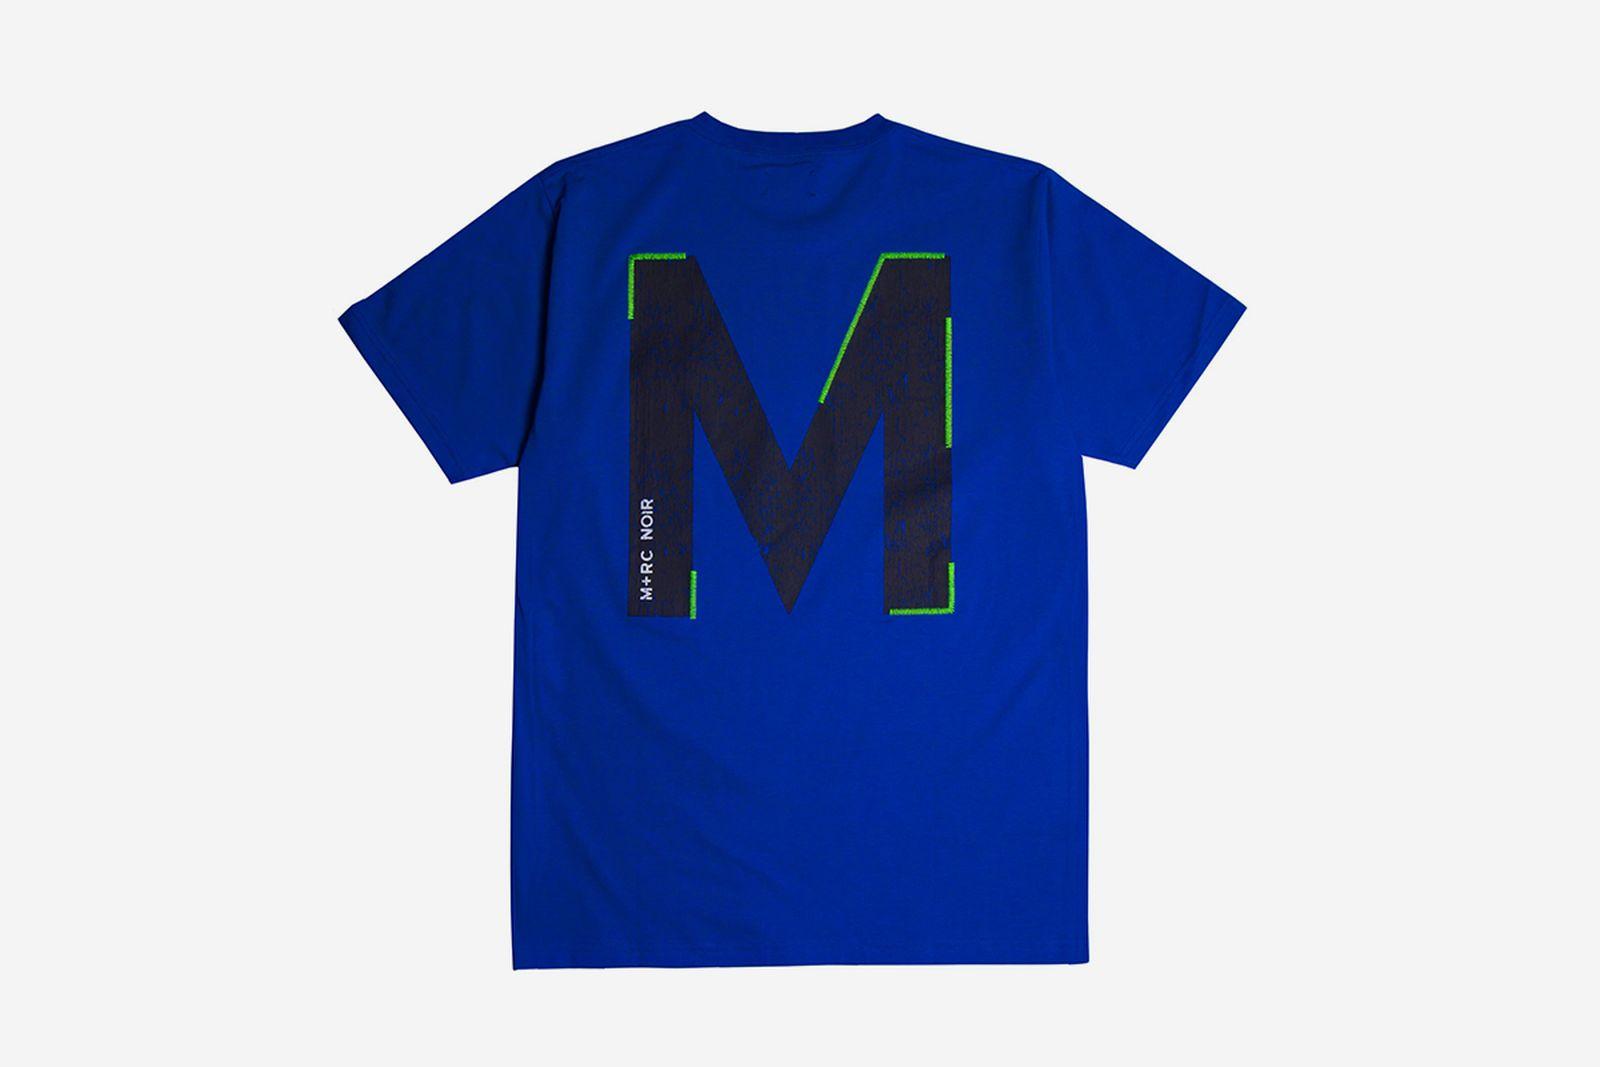 tee shirt BIG M blue back M RC 2048x2048 M+RC NOIR SS18 playboi carti